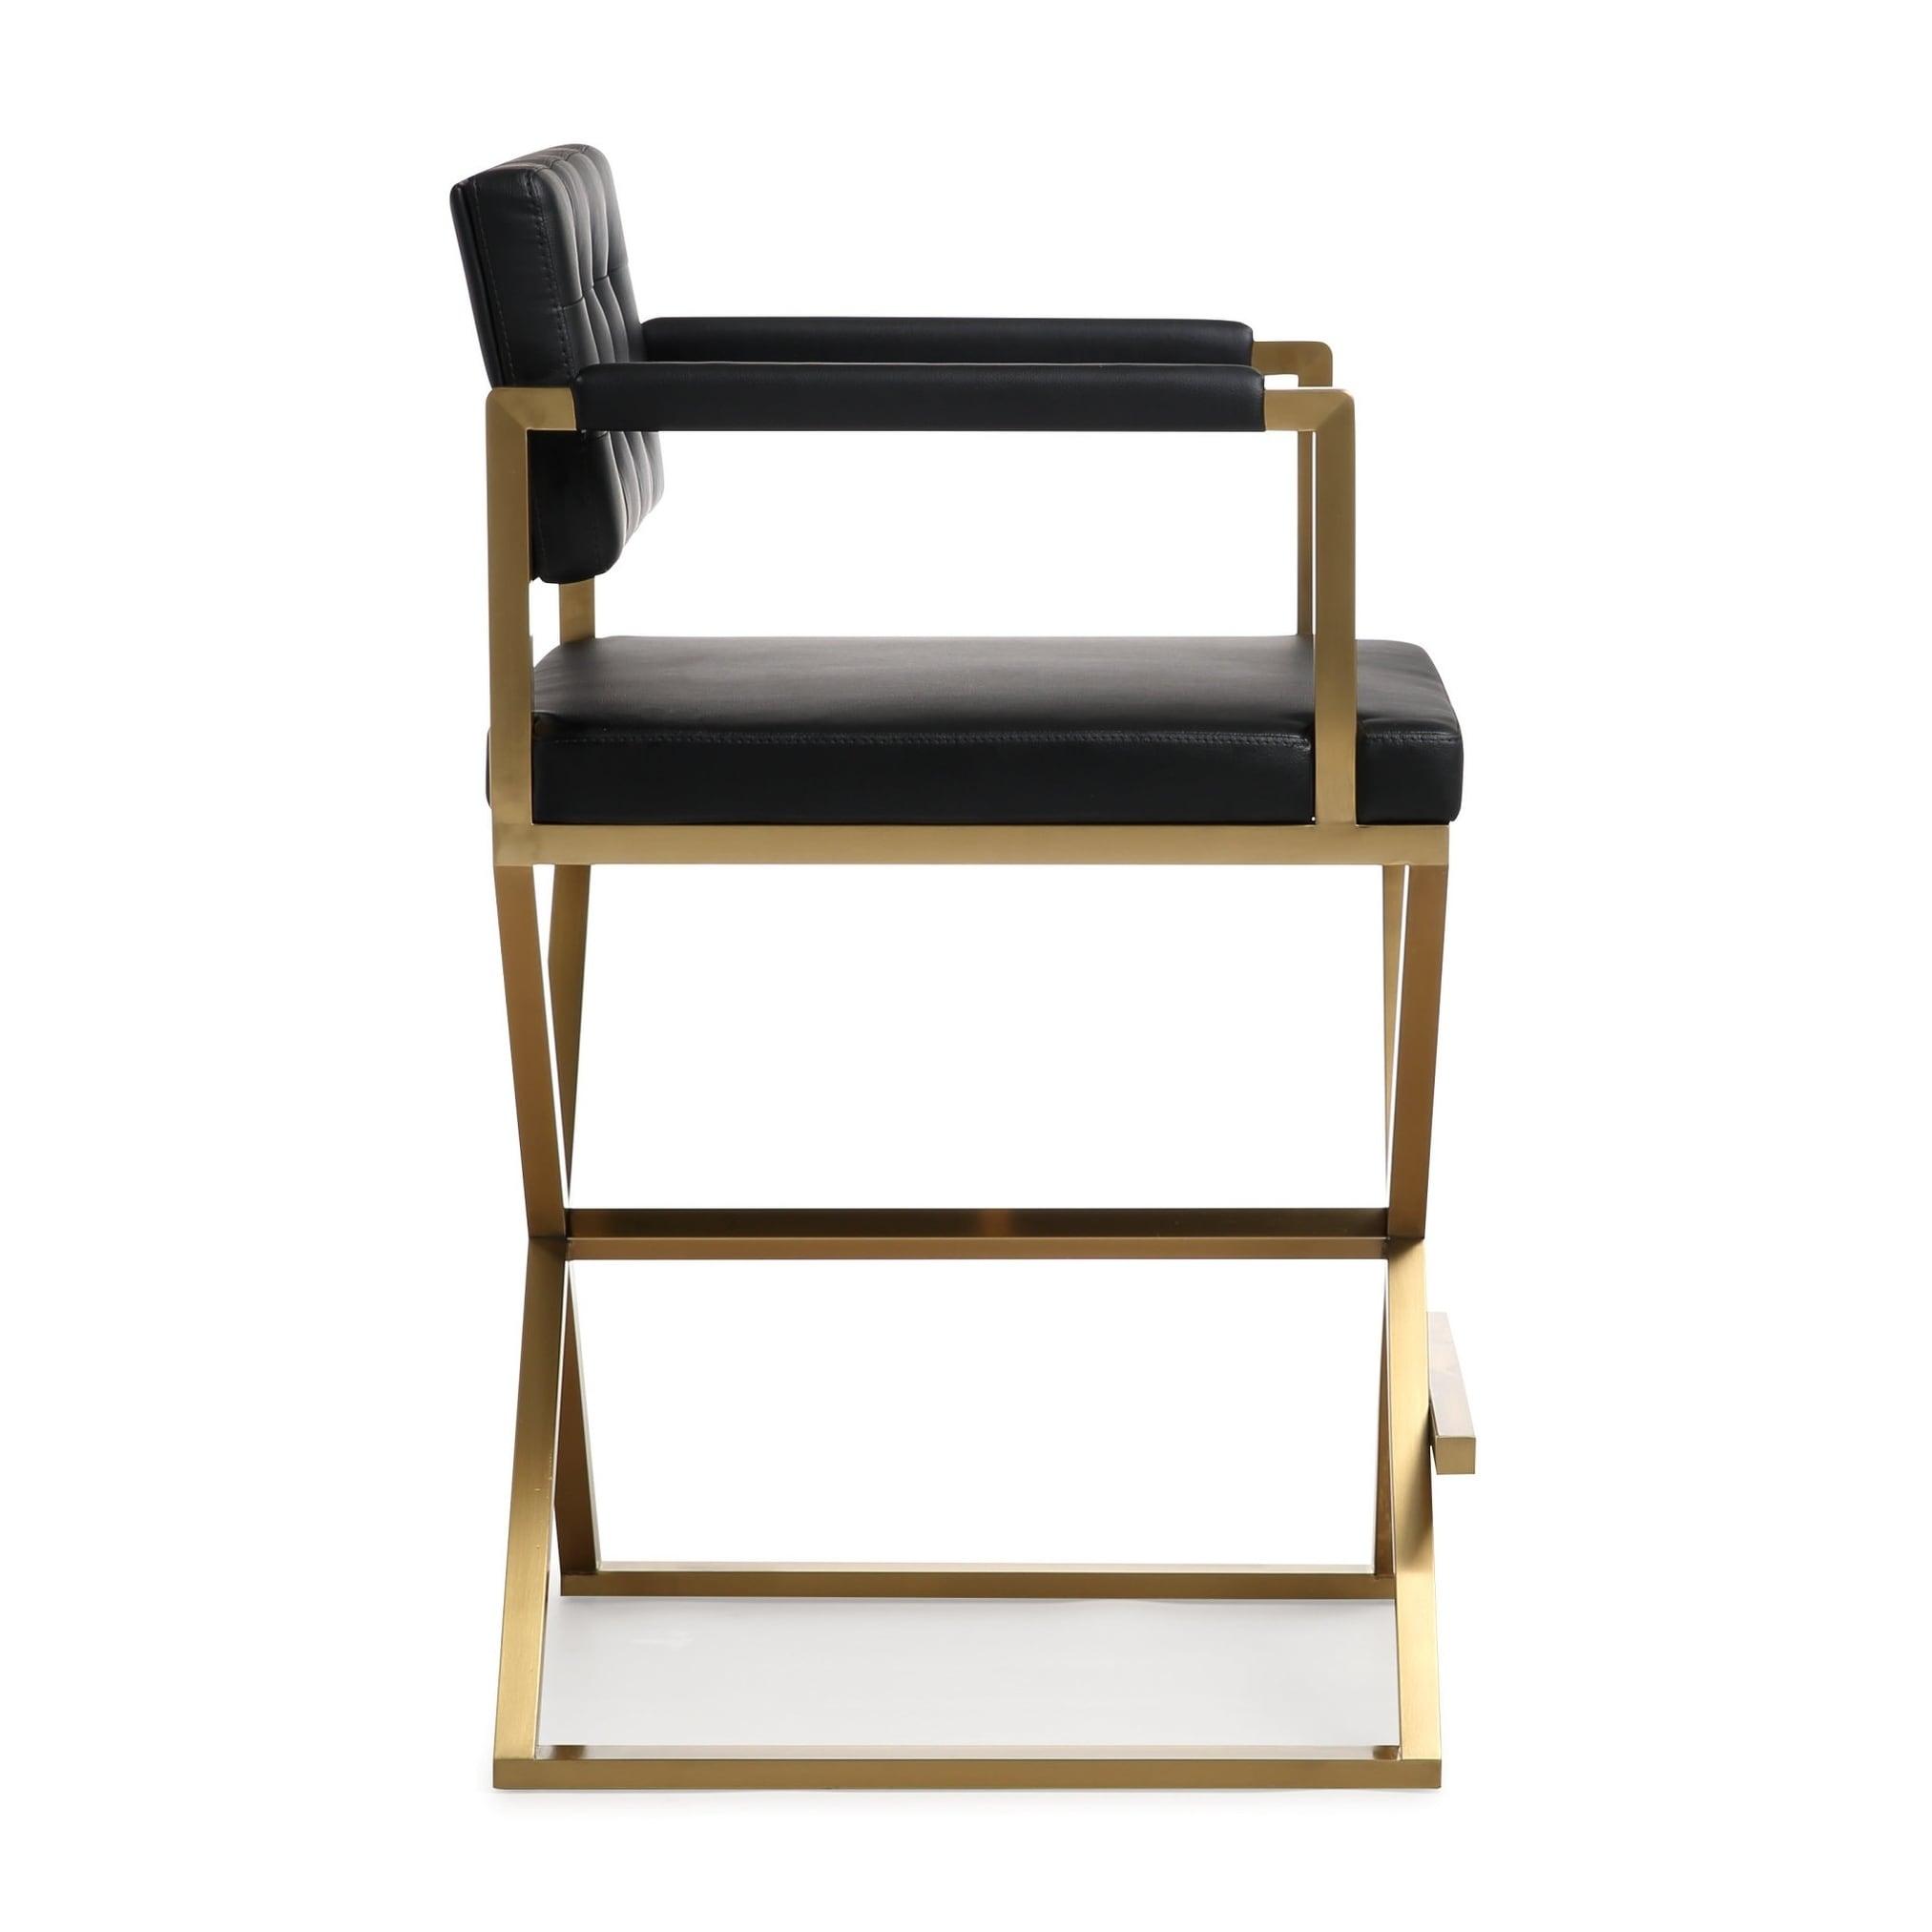 Phenomenal Director Black Gold Steel Counter Stool Unemploymentrelief Wooden Chair Designs For Living Room Unemploymentrelieforg